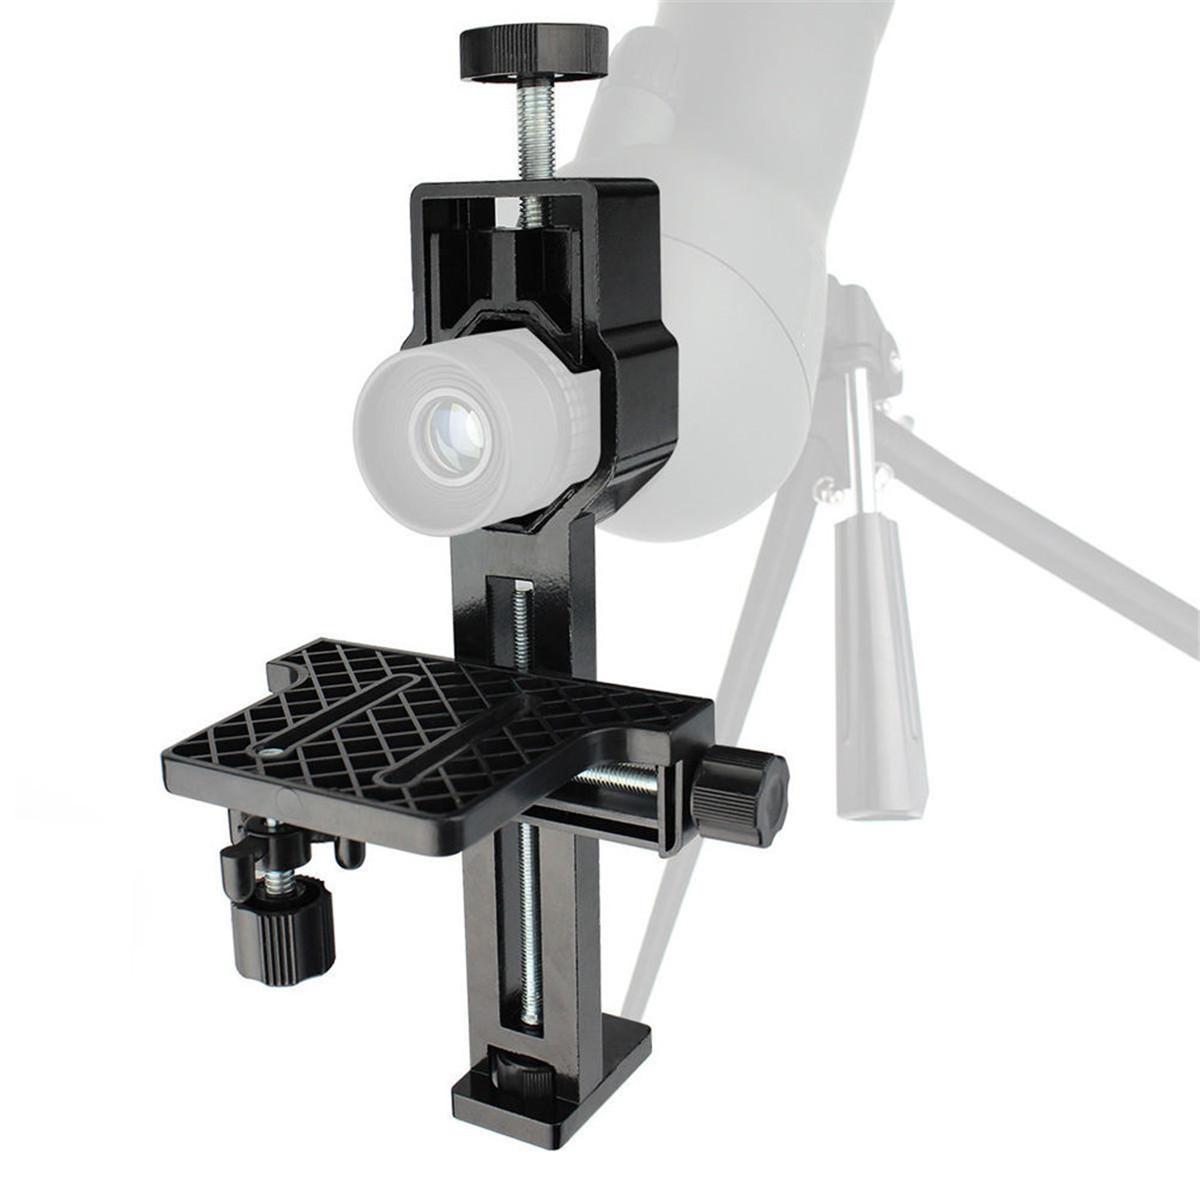 Universal Digital Camera Adapter Mount Stand For Scopes Spotting Scope Telescope